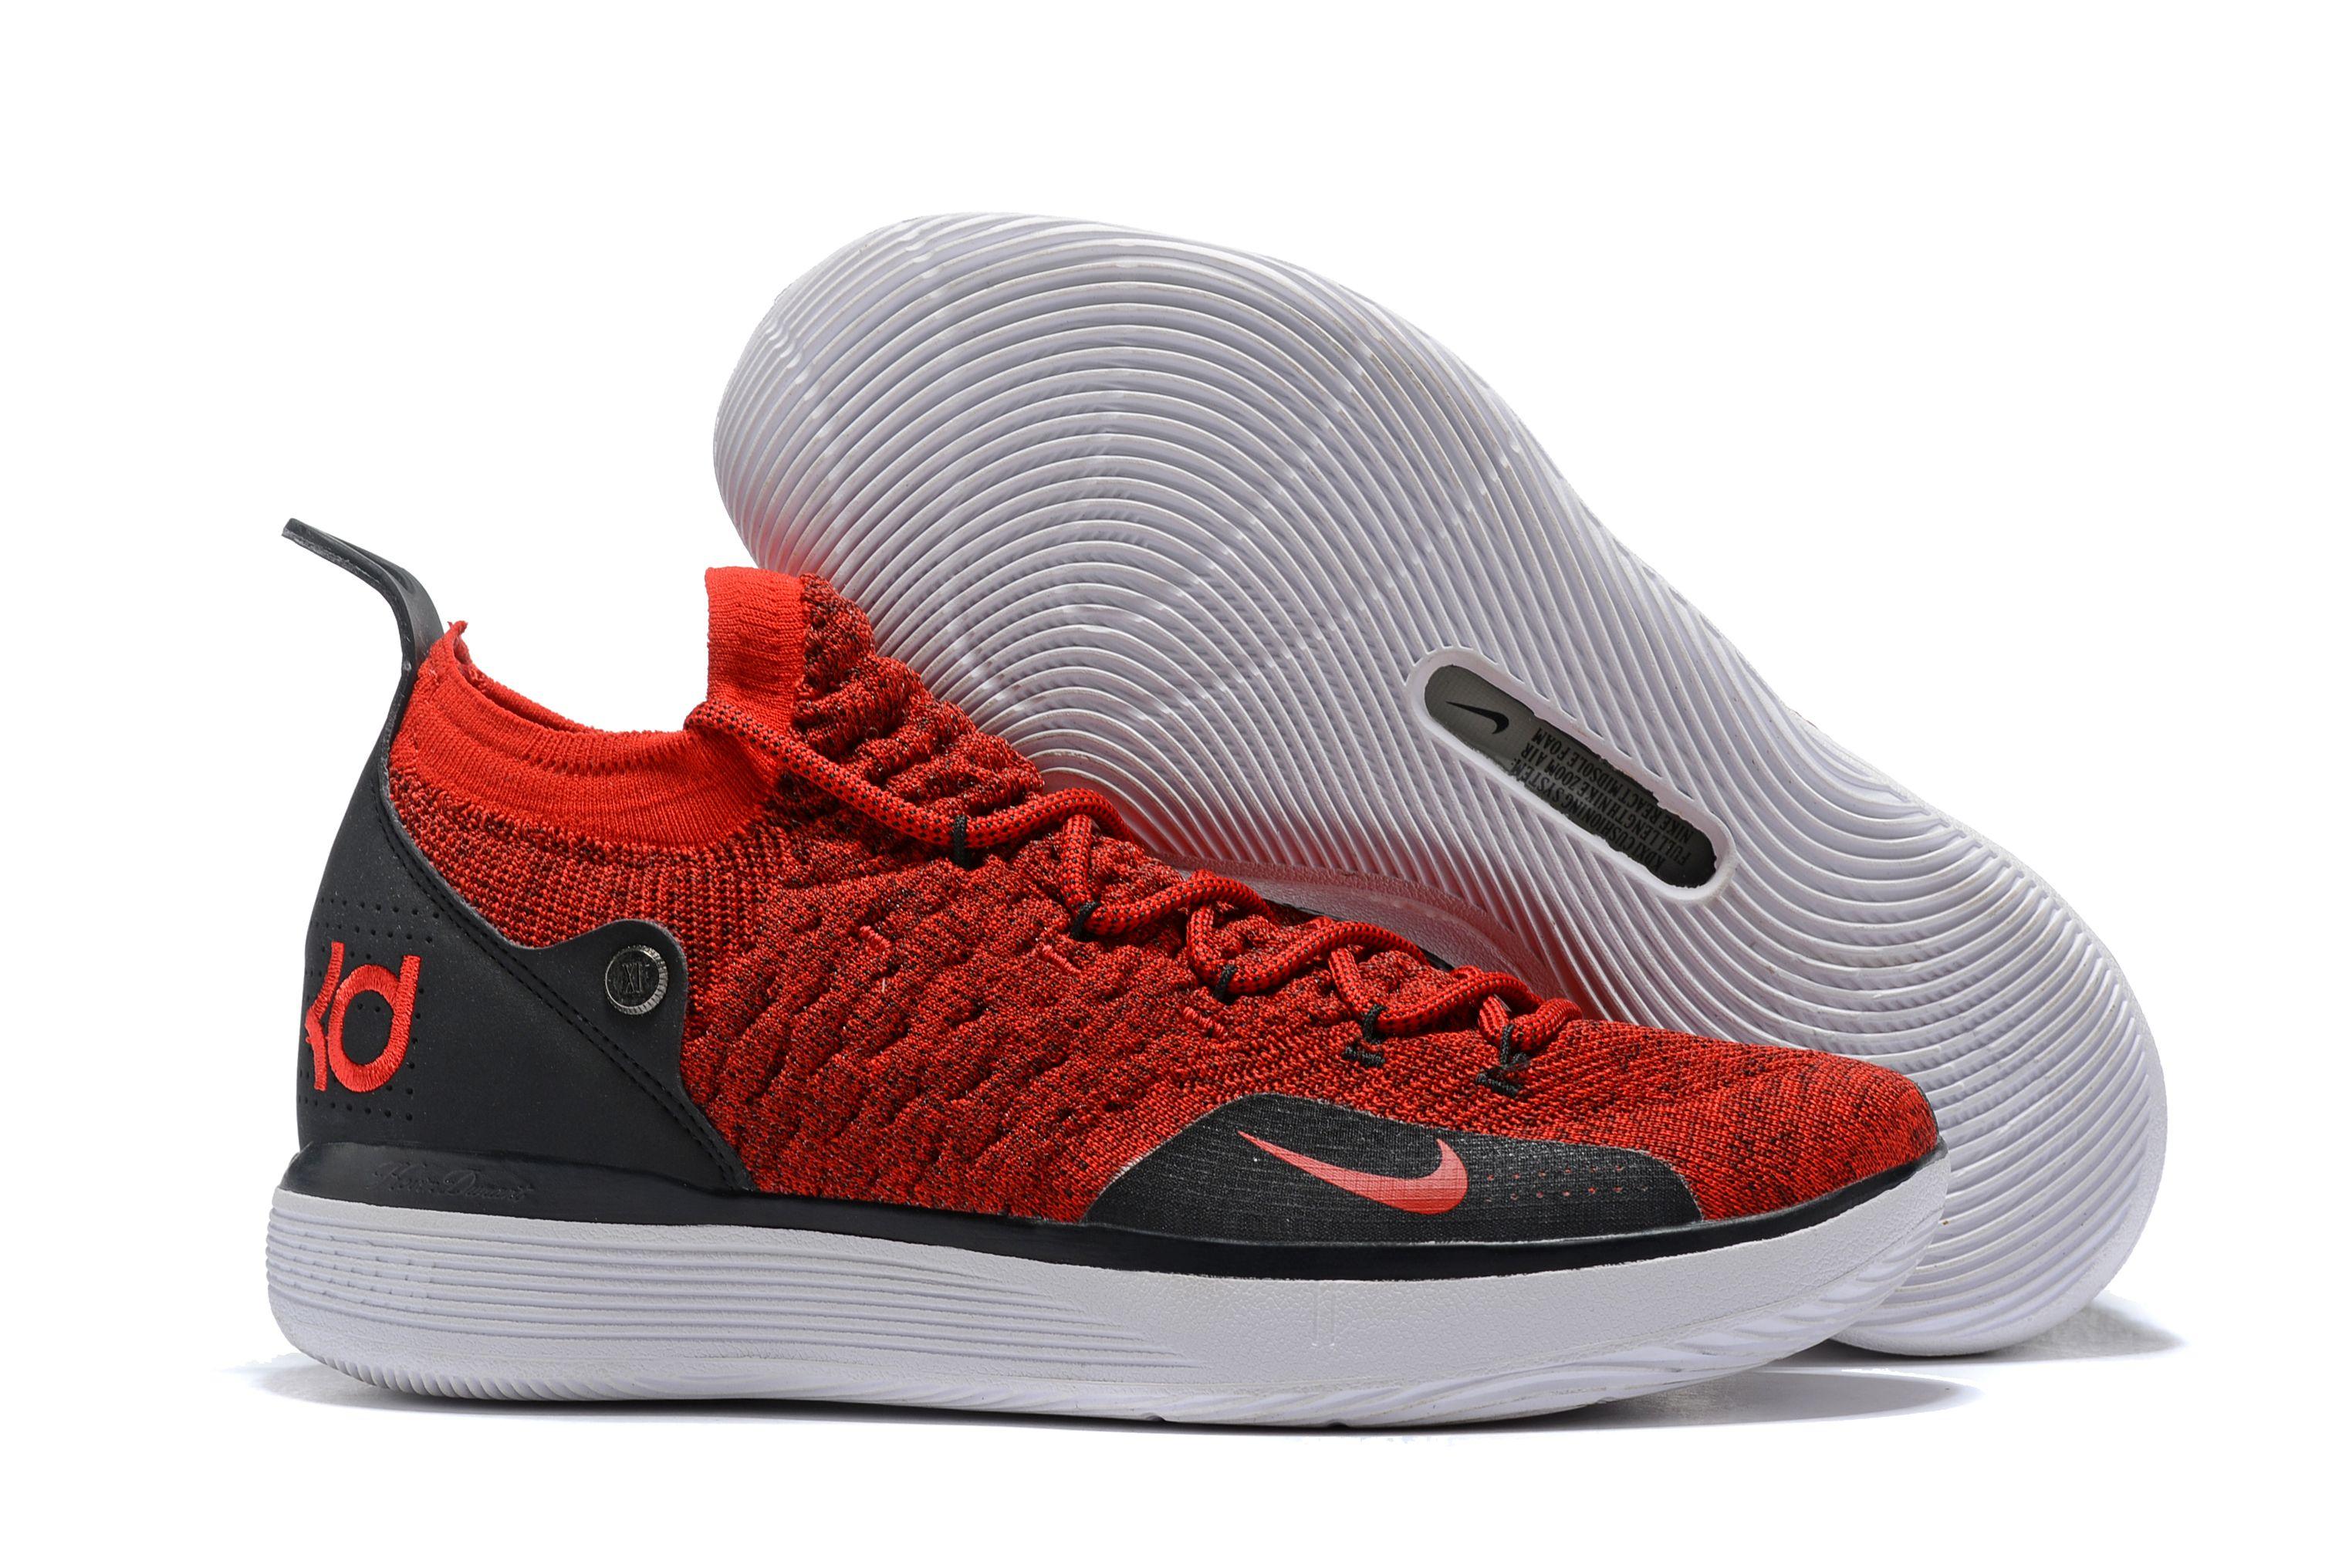 Men's Nike KD 11 Red Black White 2018